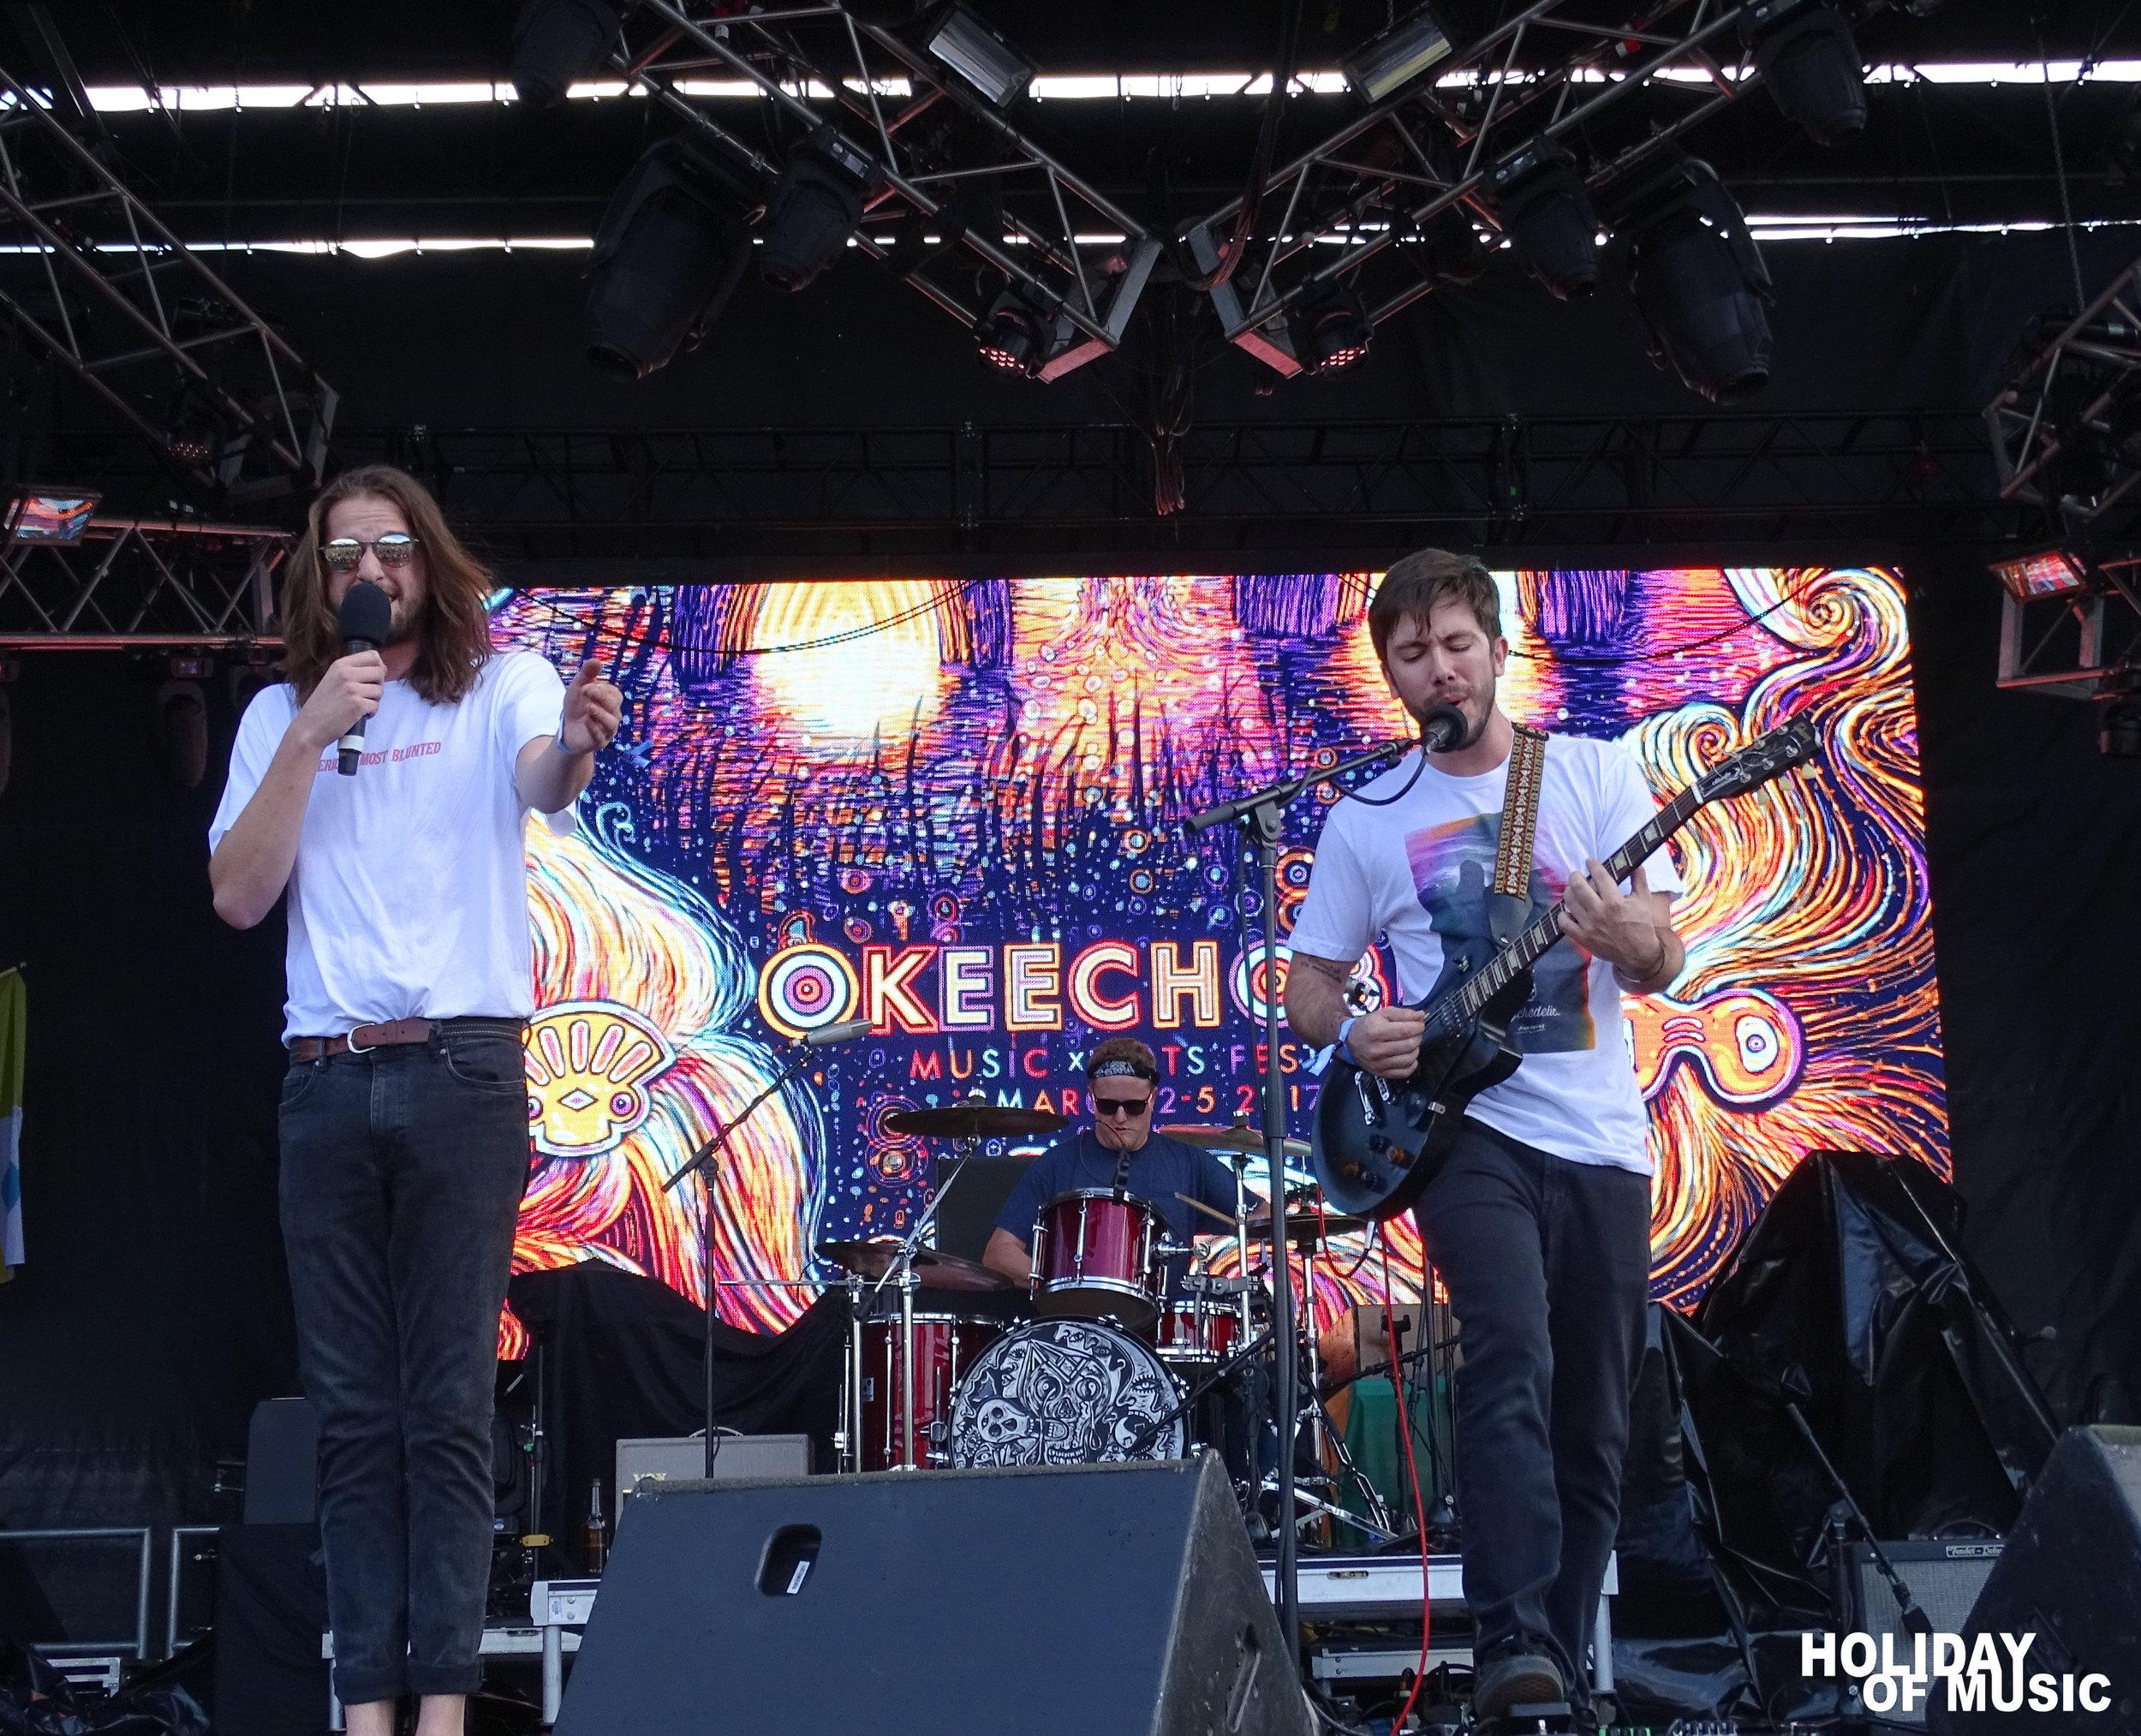 Gary Lazer Eyes - Okeechobee Music & Arts Festival 2017